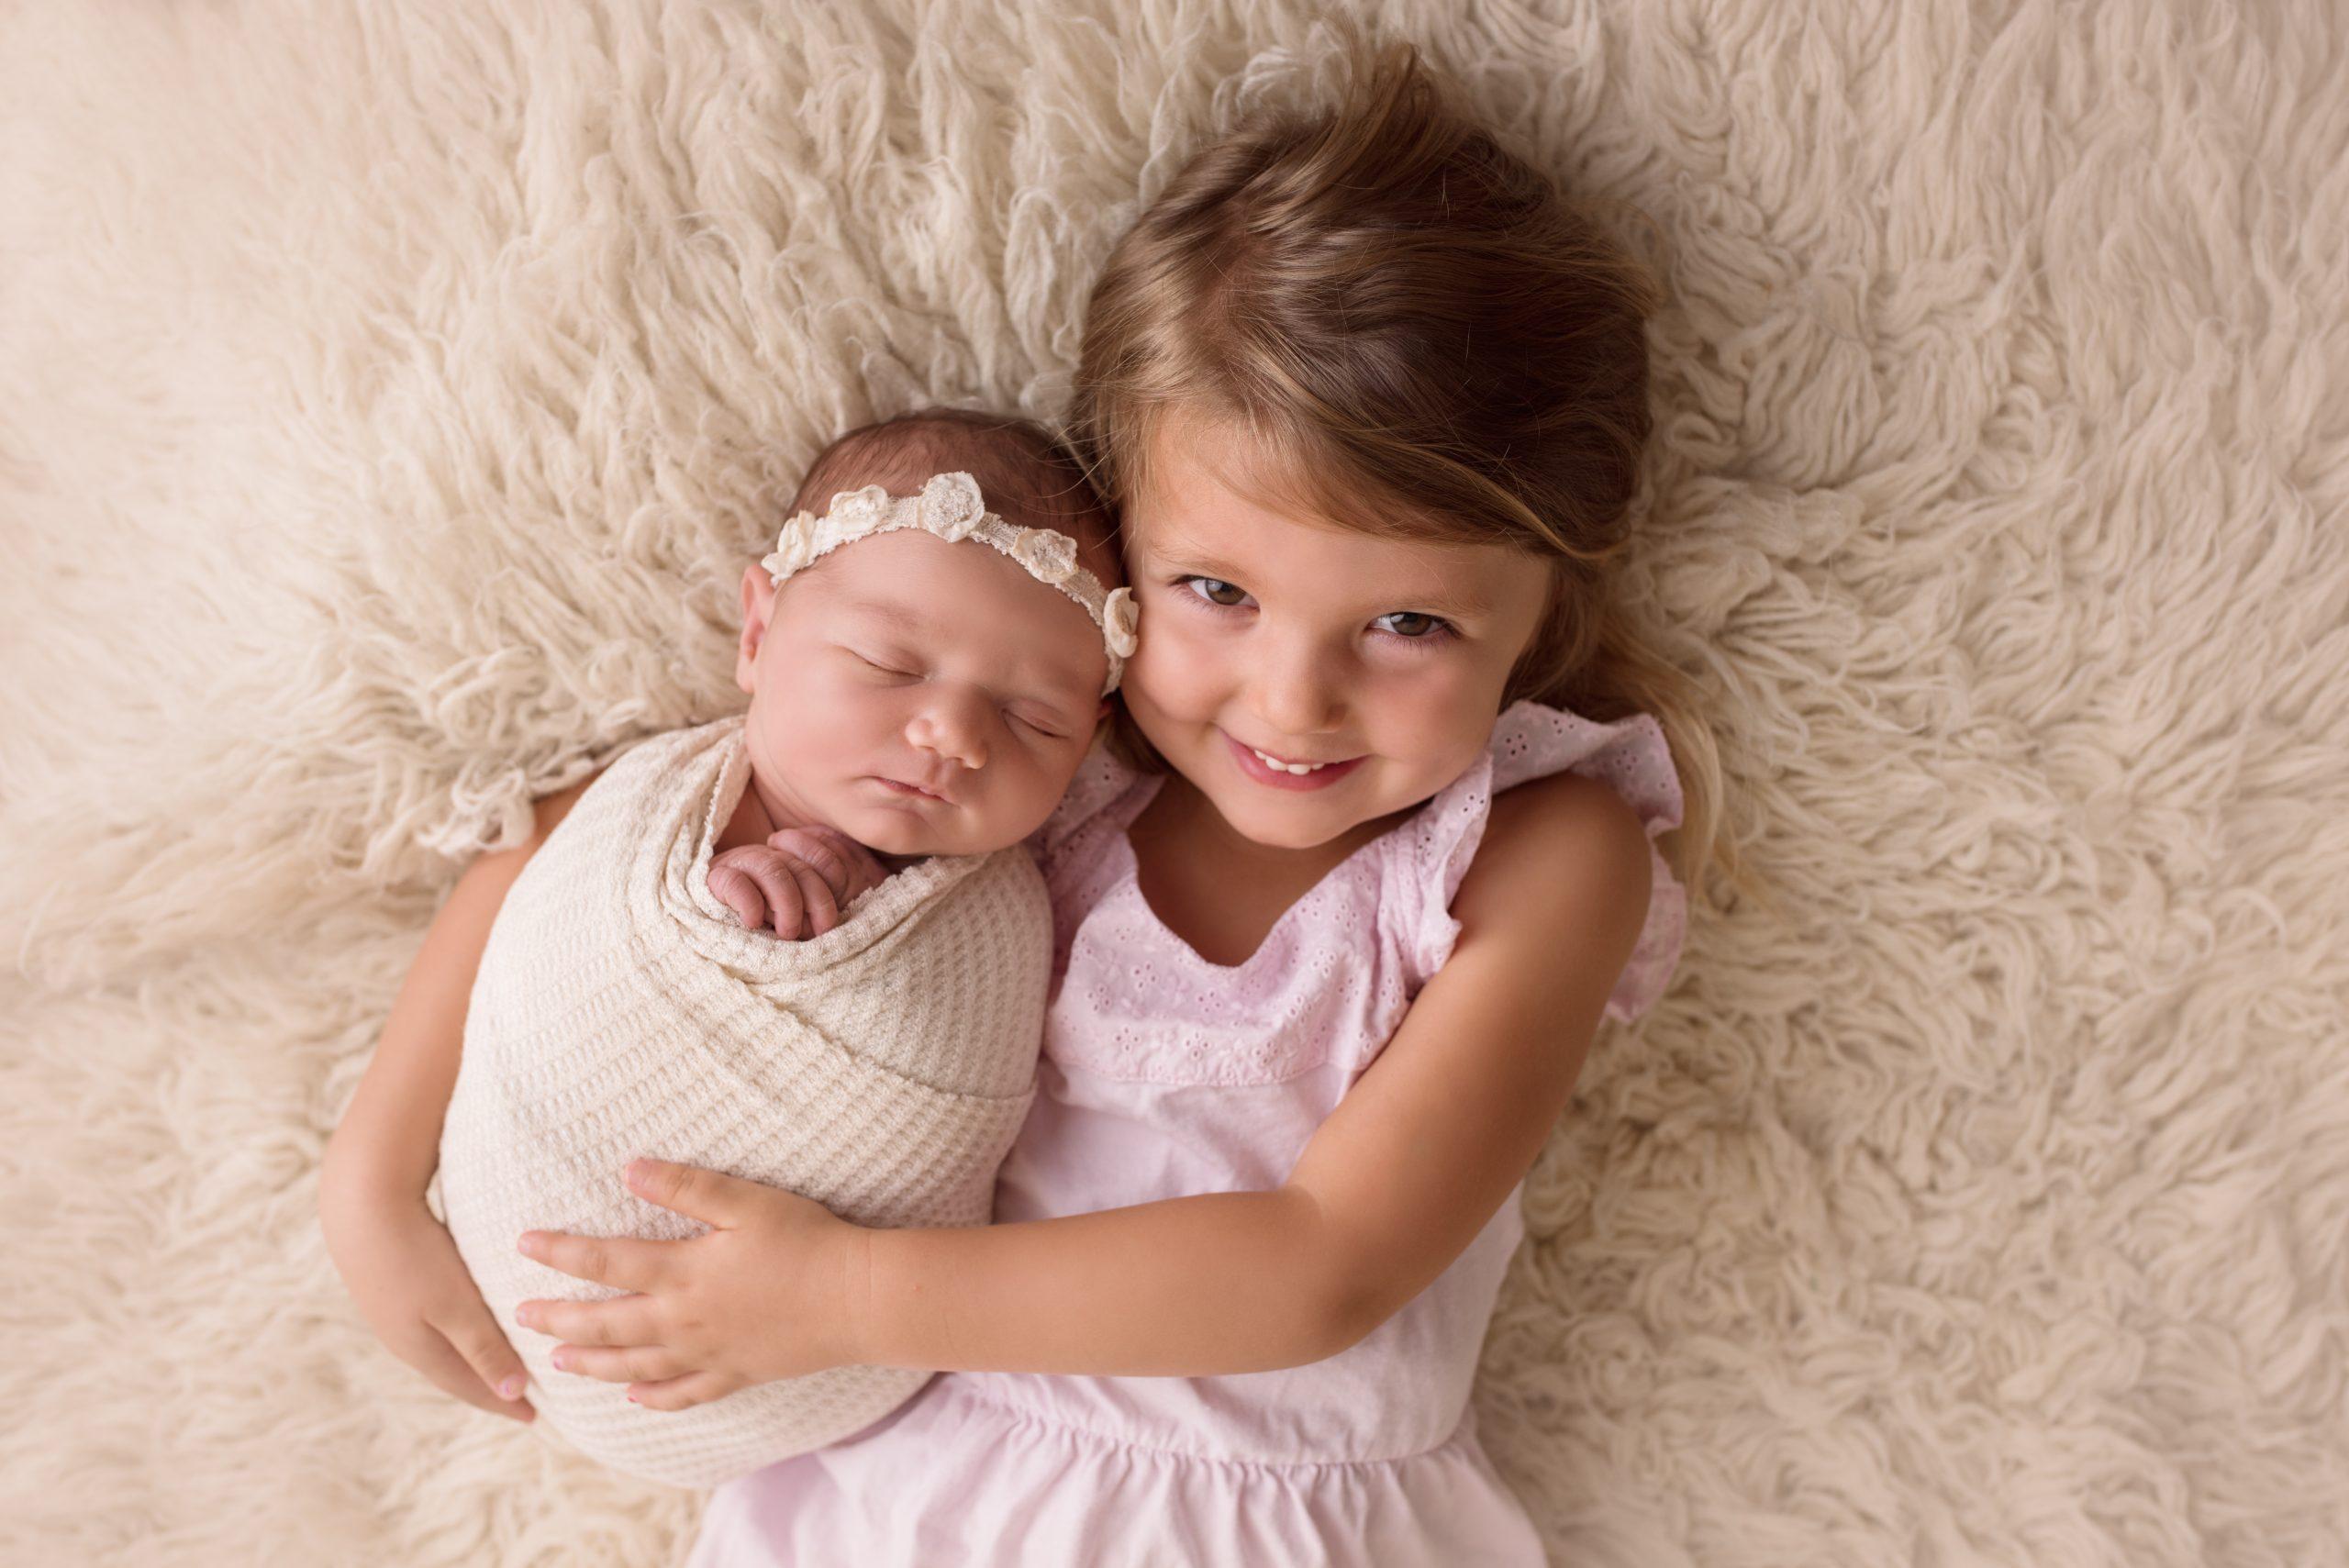 Newborn posed with big sister sibling poses on flokati rug